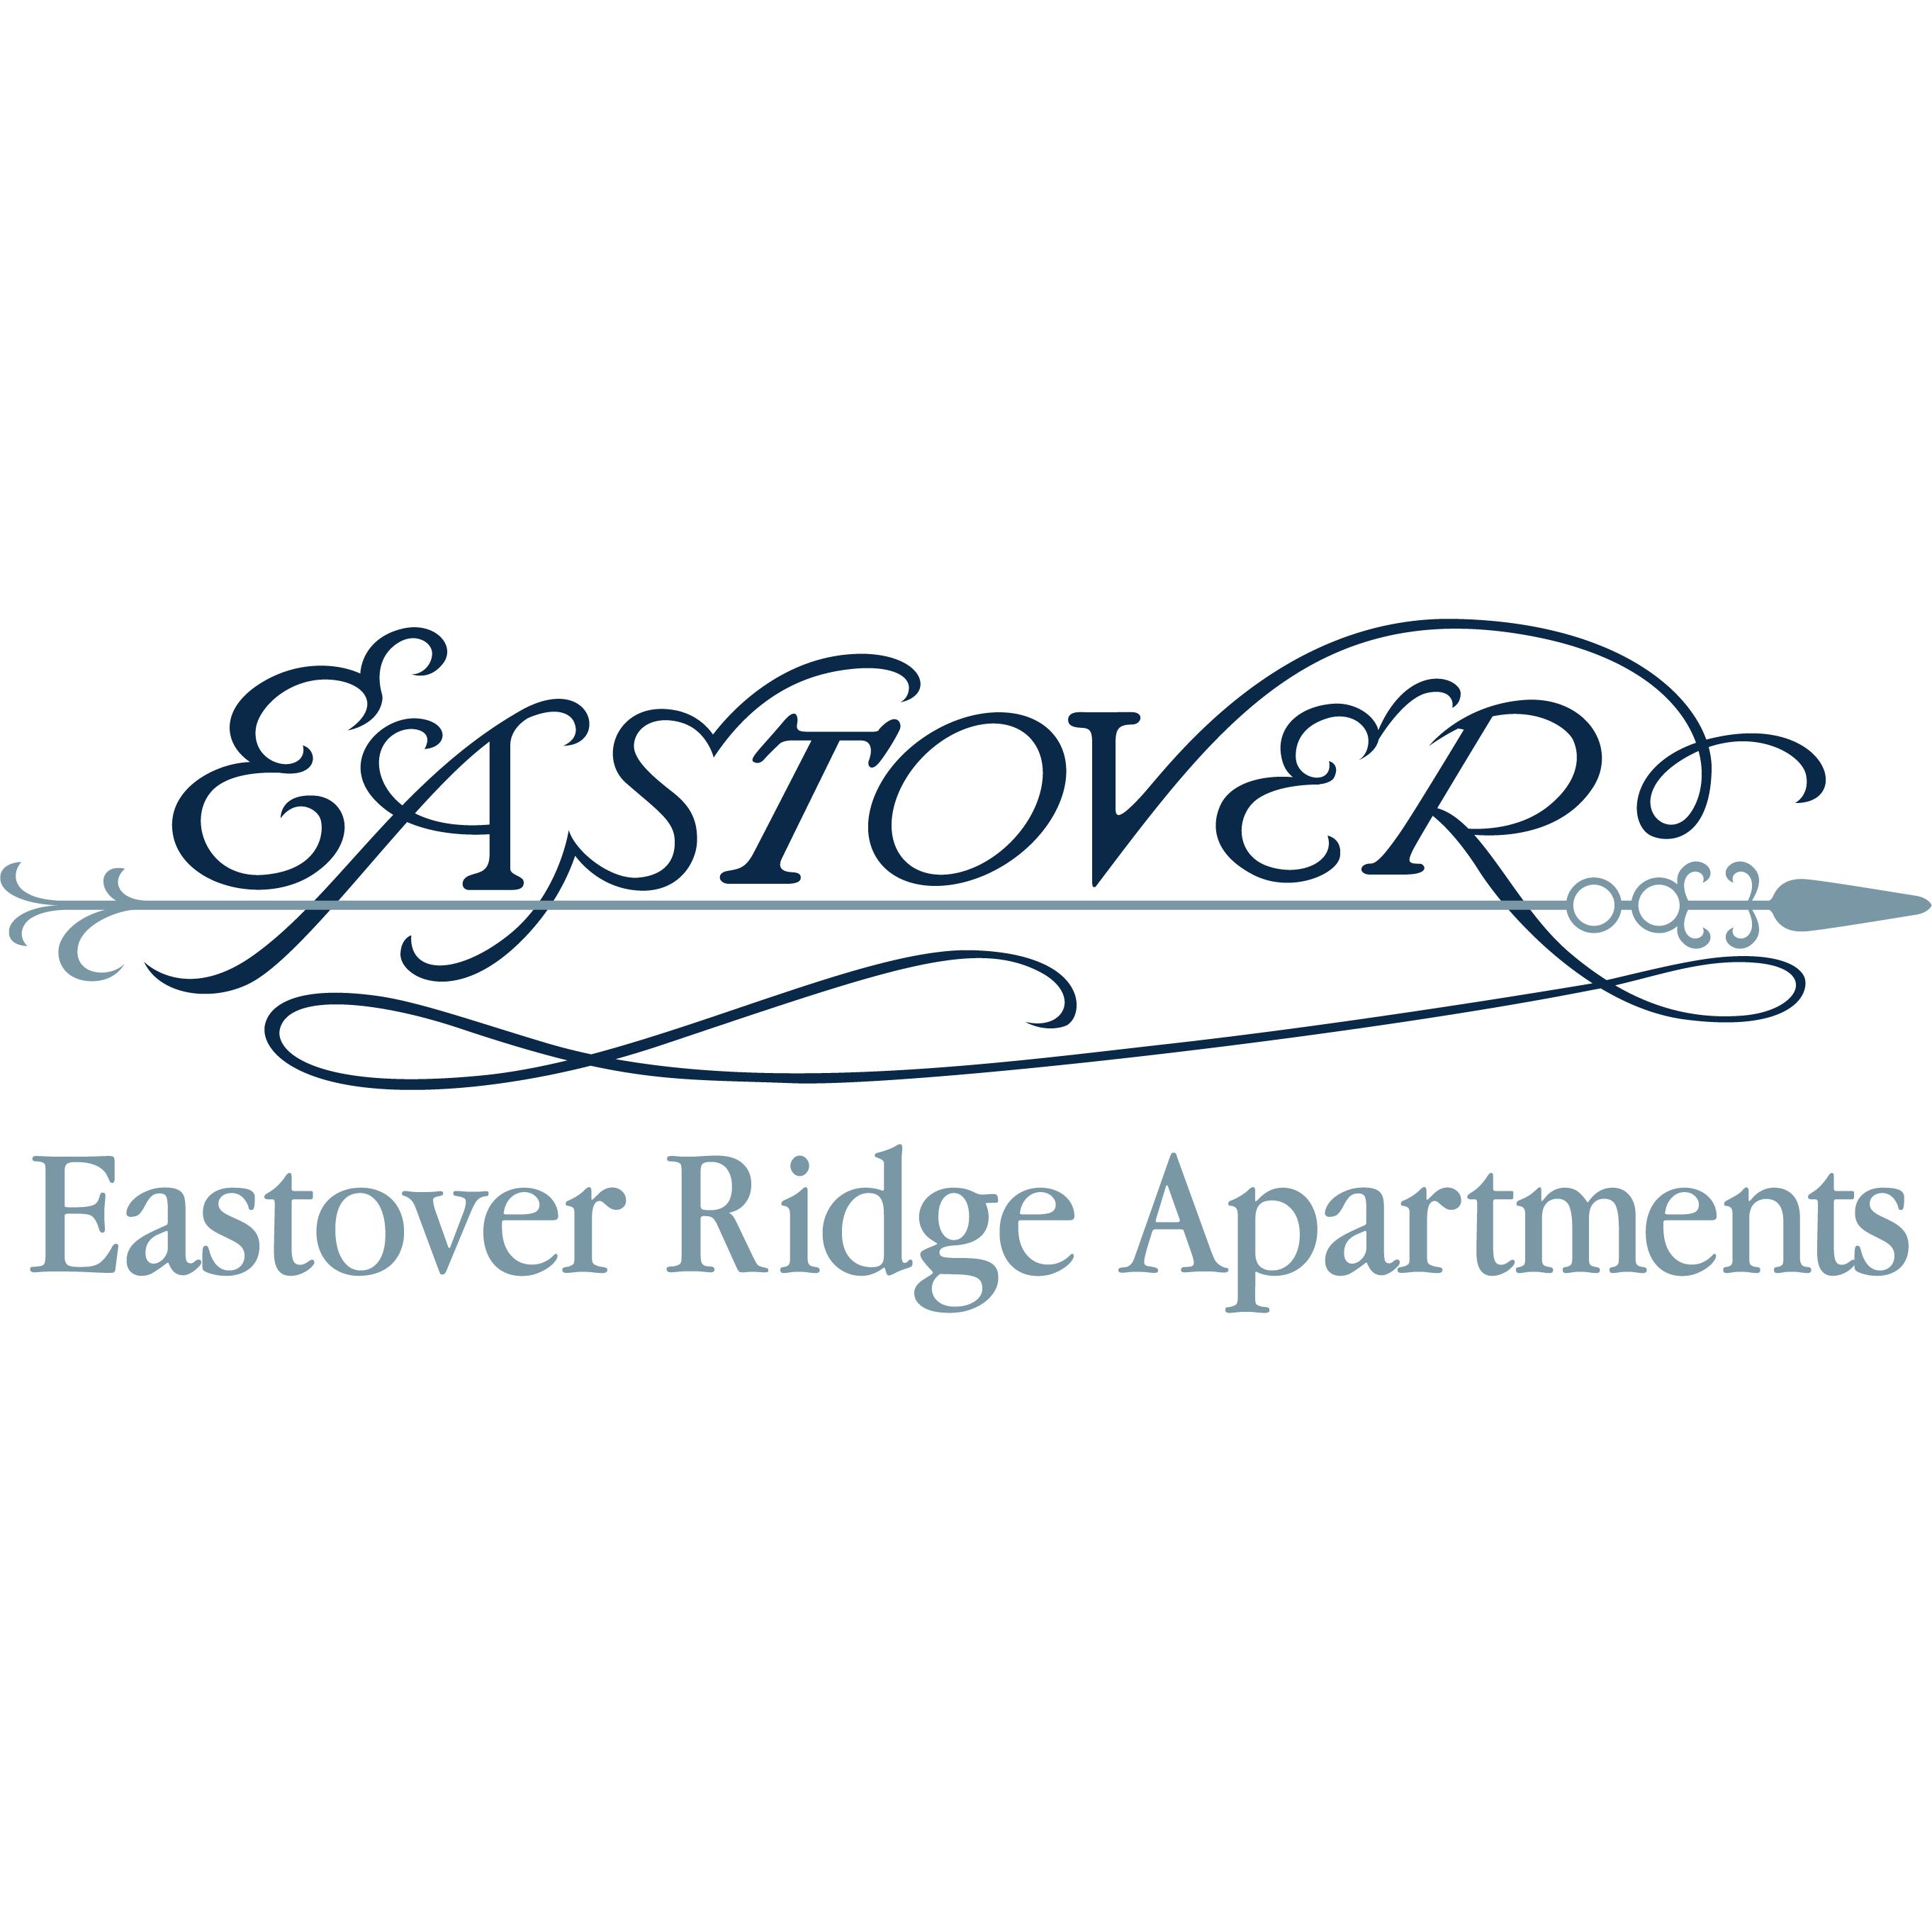 Eastover Ridge